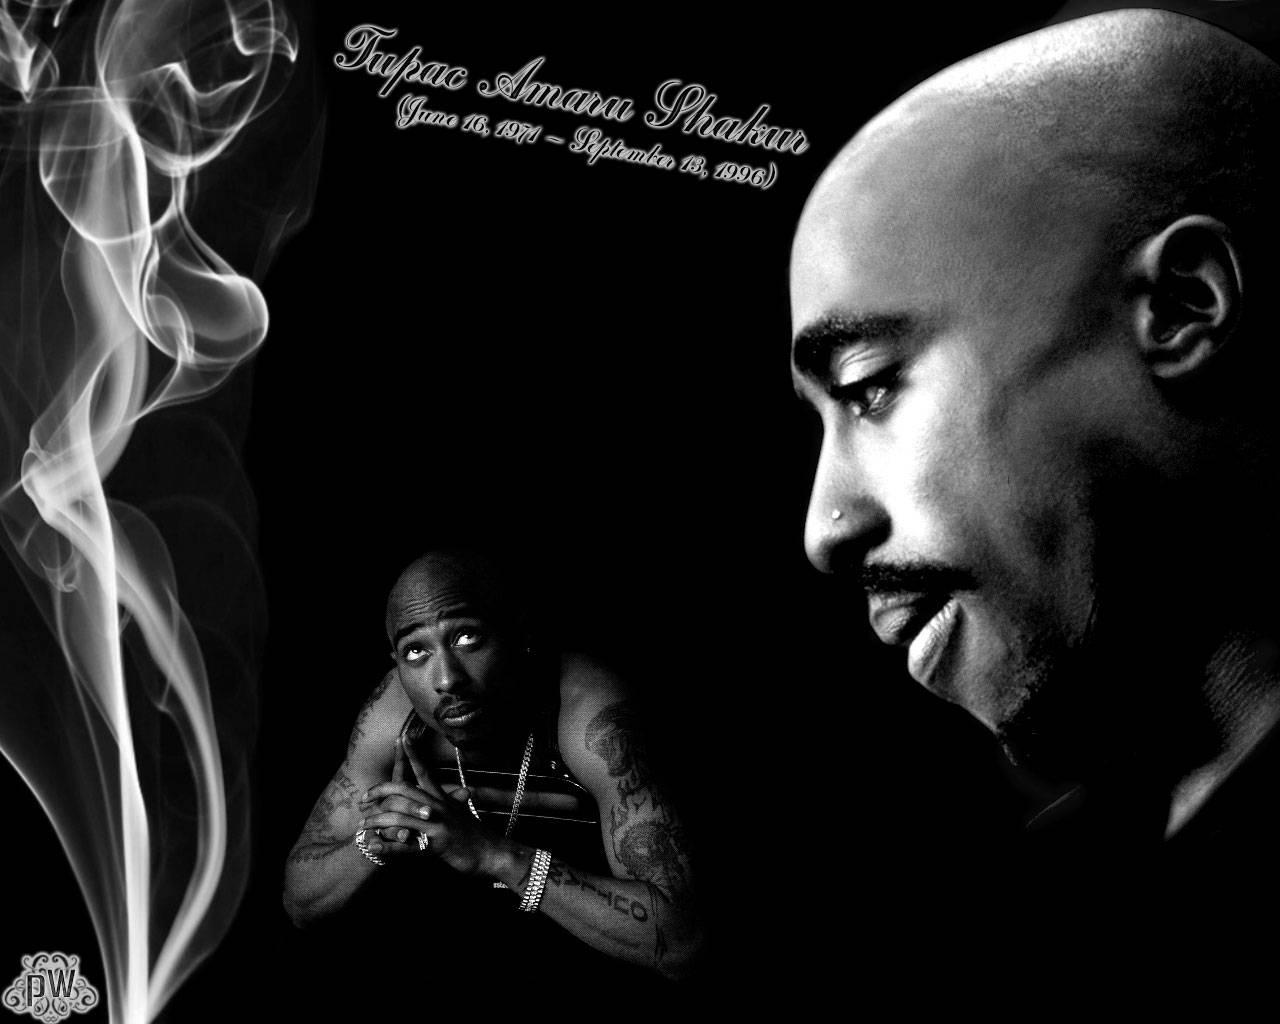 2Pac Shakur Rest In Peace Wallpaper   2pac Wallpaper 1280x1024